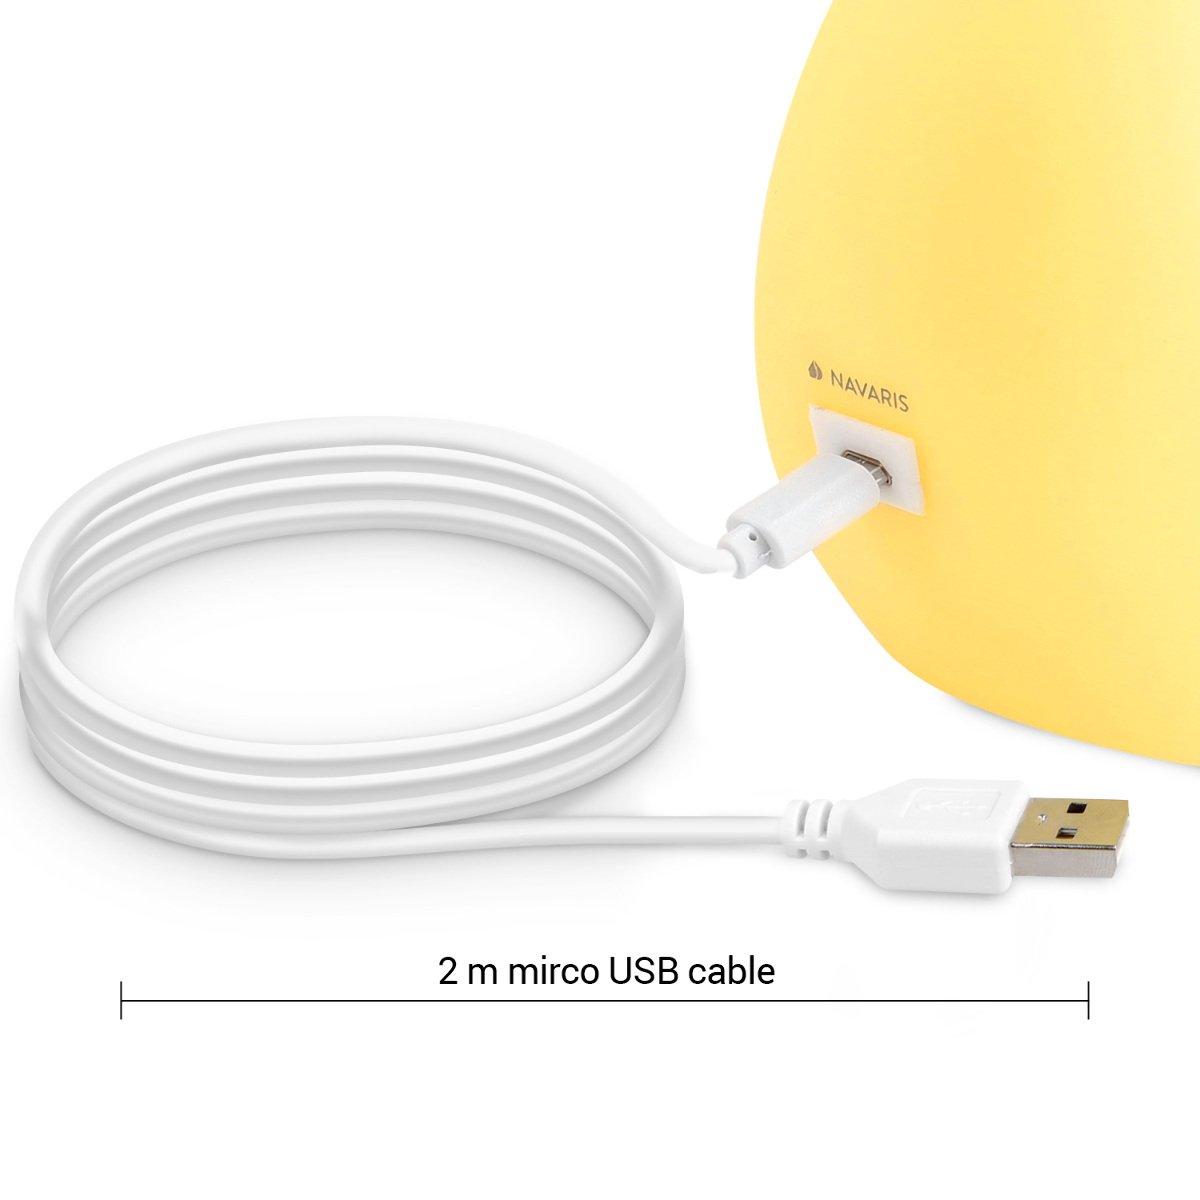 Navaris LED Nachtlicht Mond Design - 2m USB-Kabel & Batterie ...